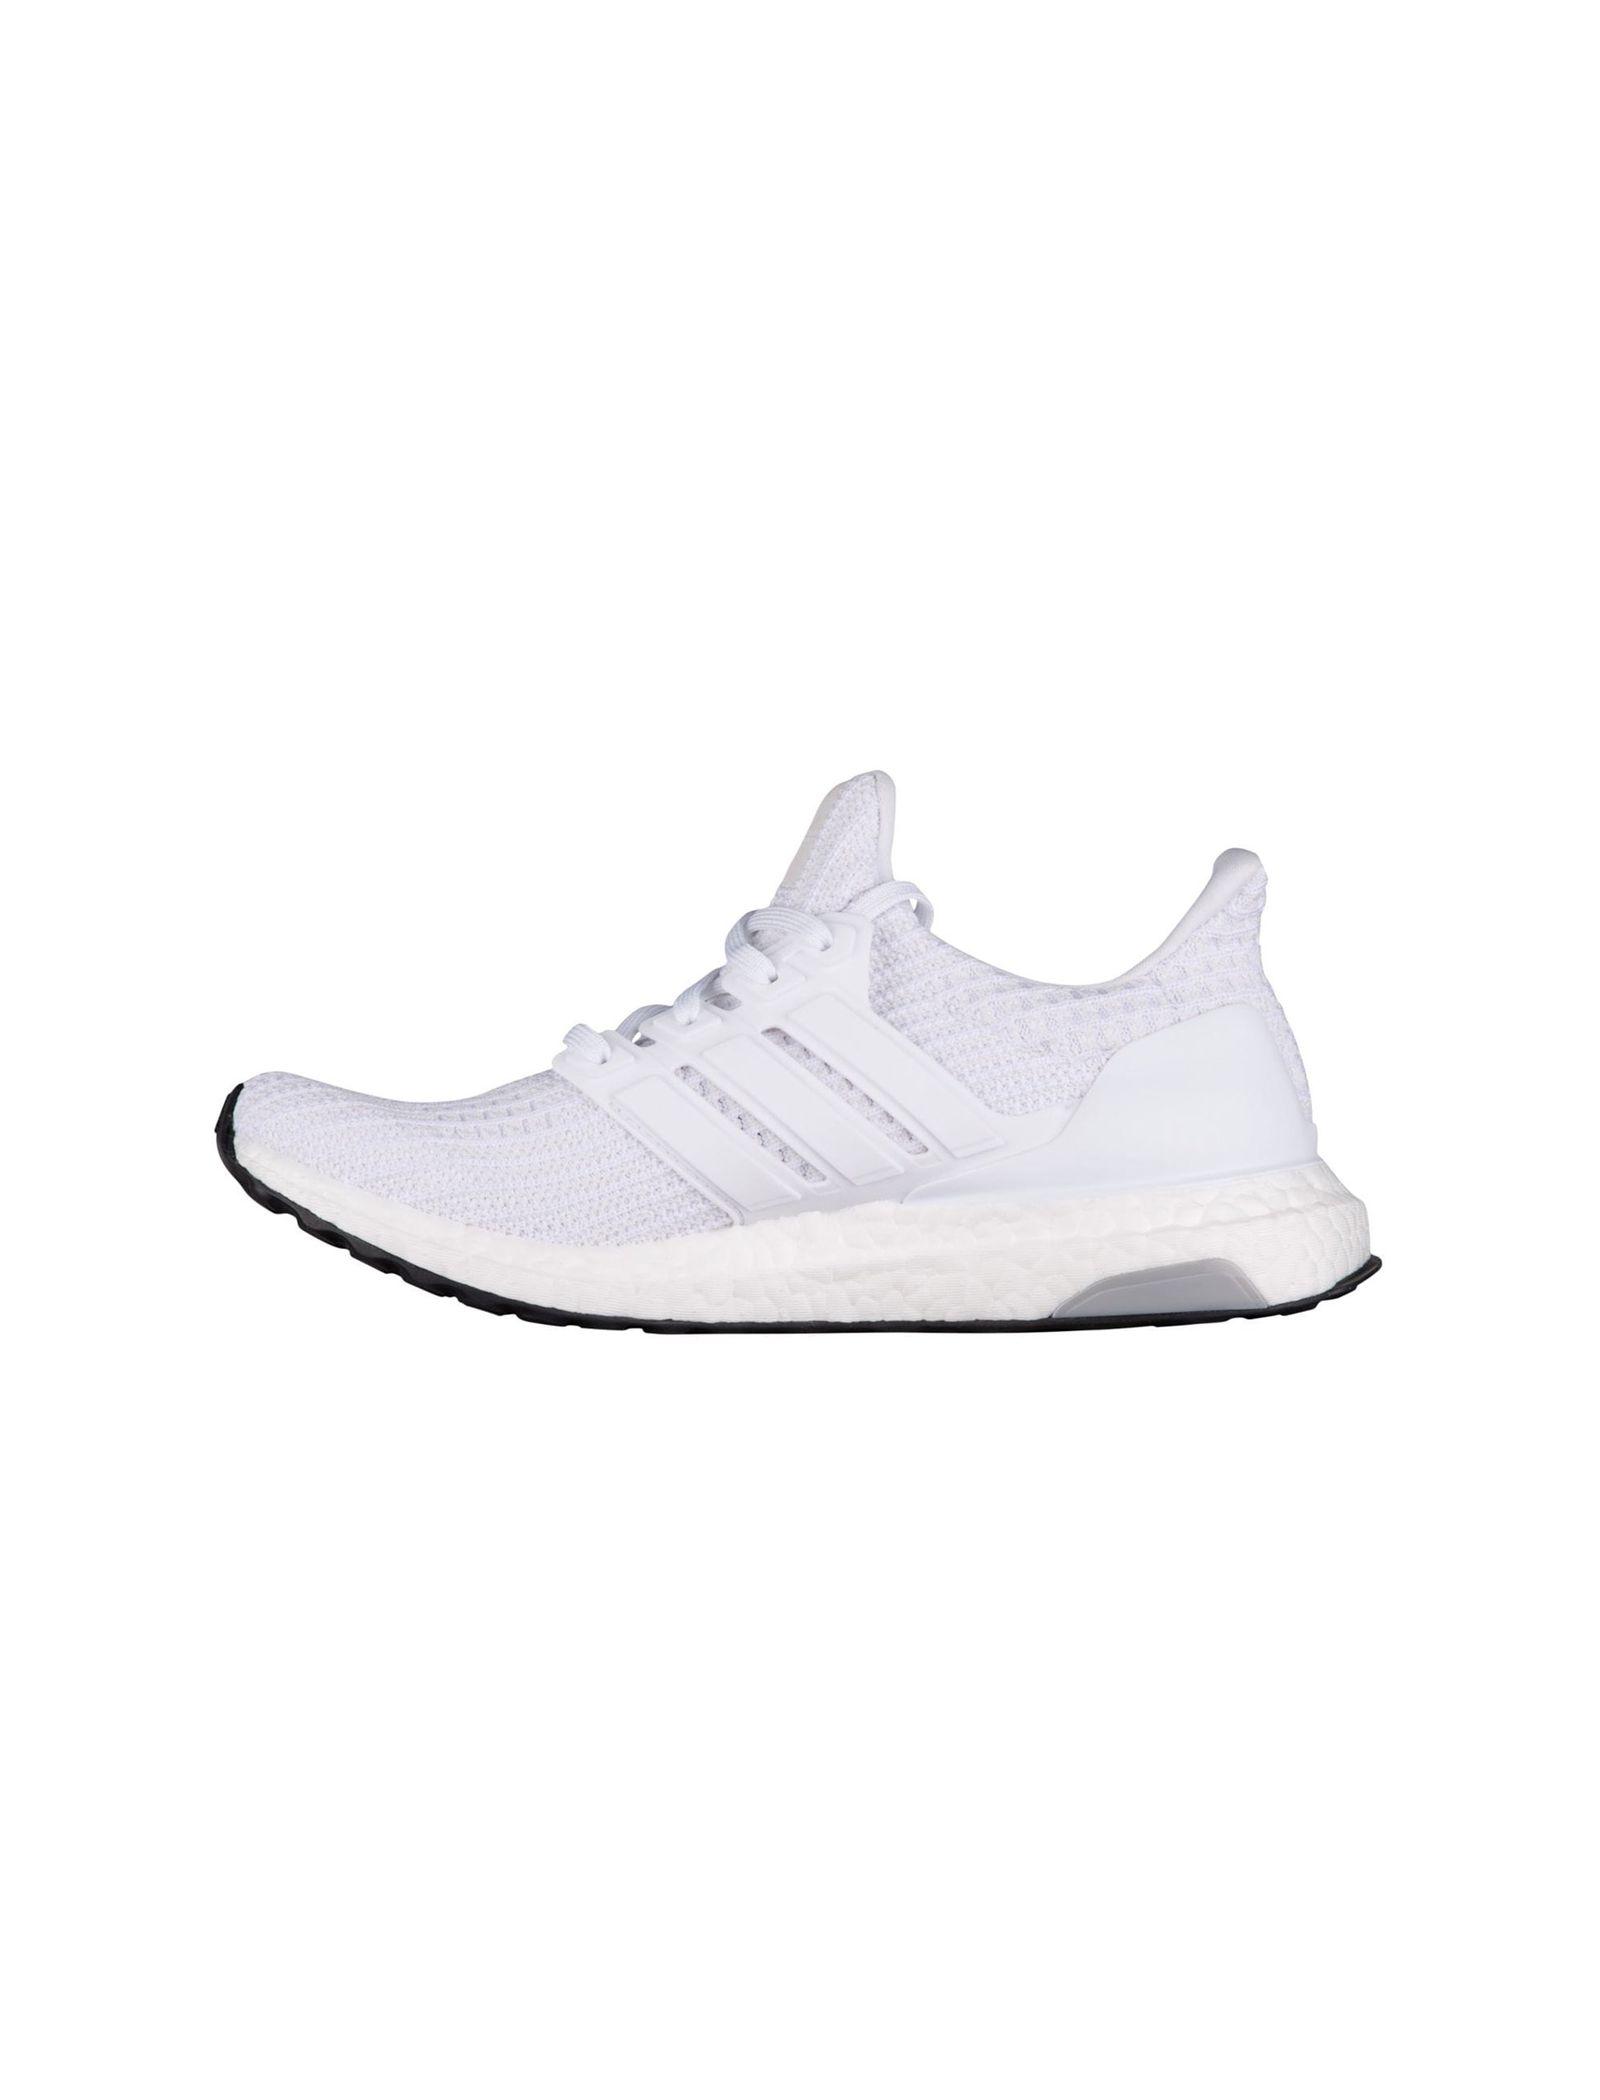 کفش مخصوص دویدن زنانه آدیداس مدل ULTRABOOST - سفيد - 5